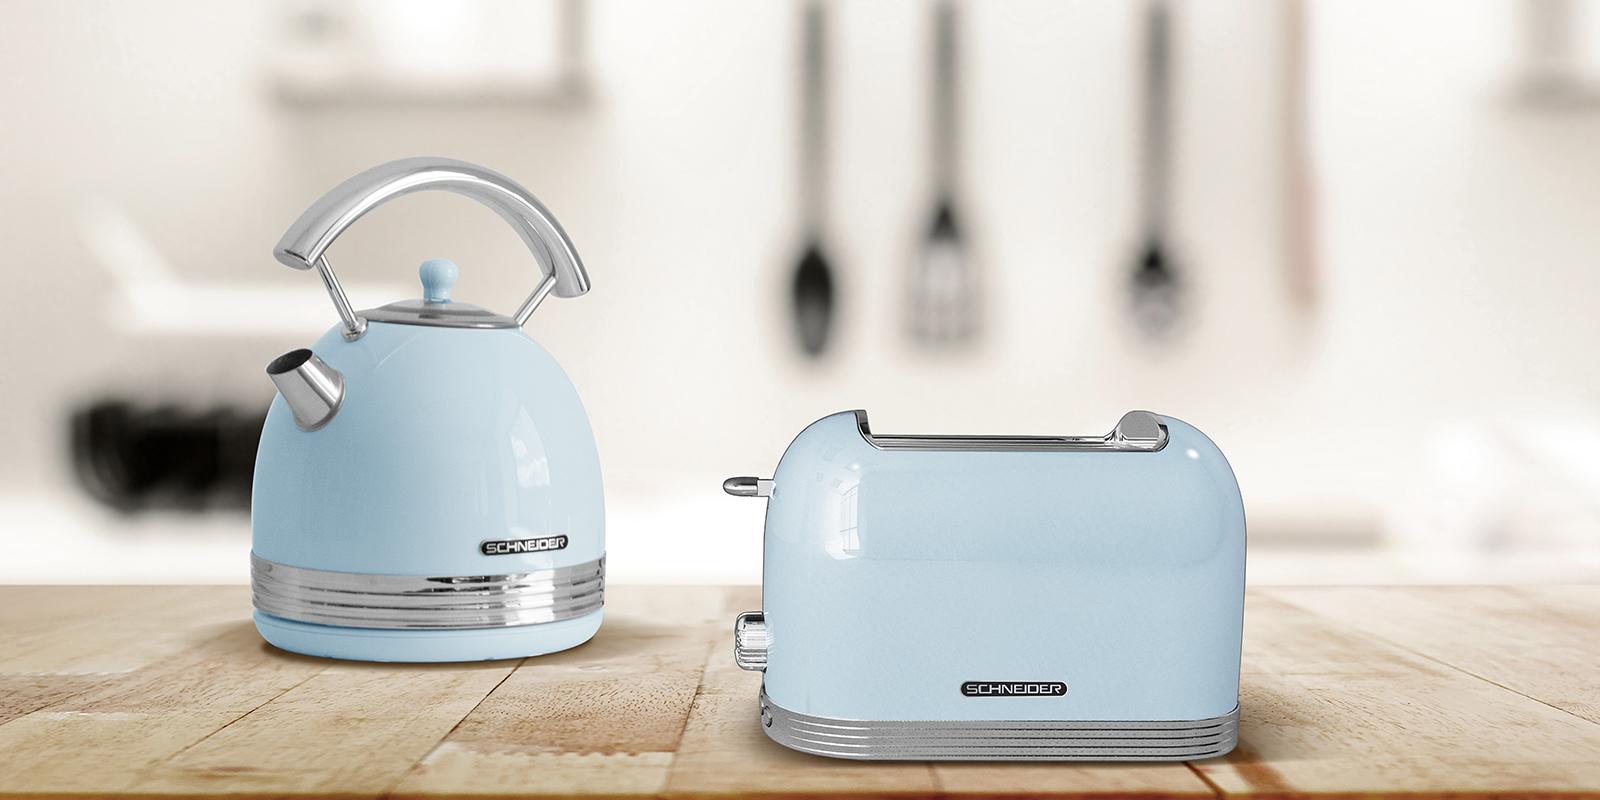 Schneider, retro keukenmachines, keukenapparatuur, koelkasten